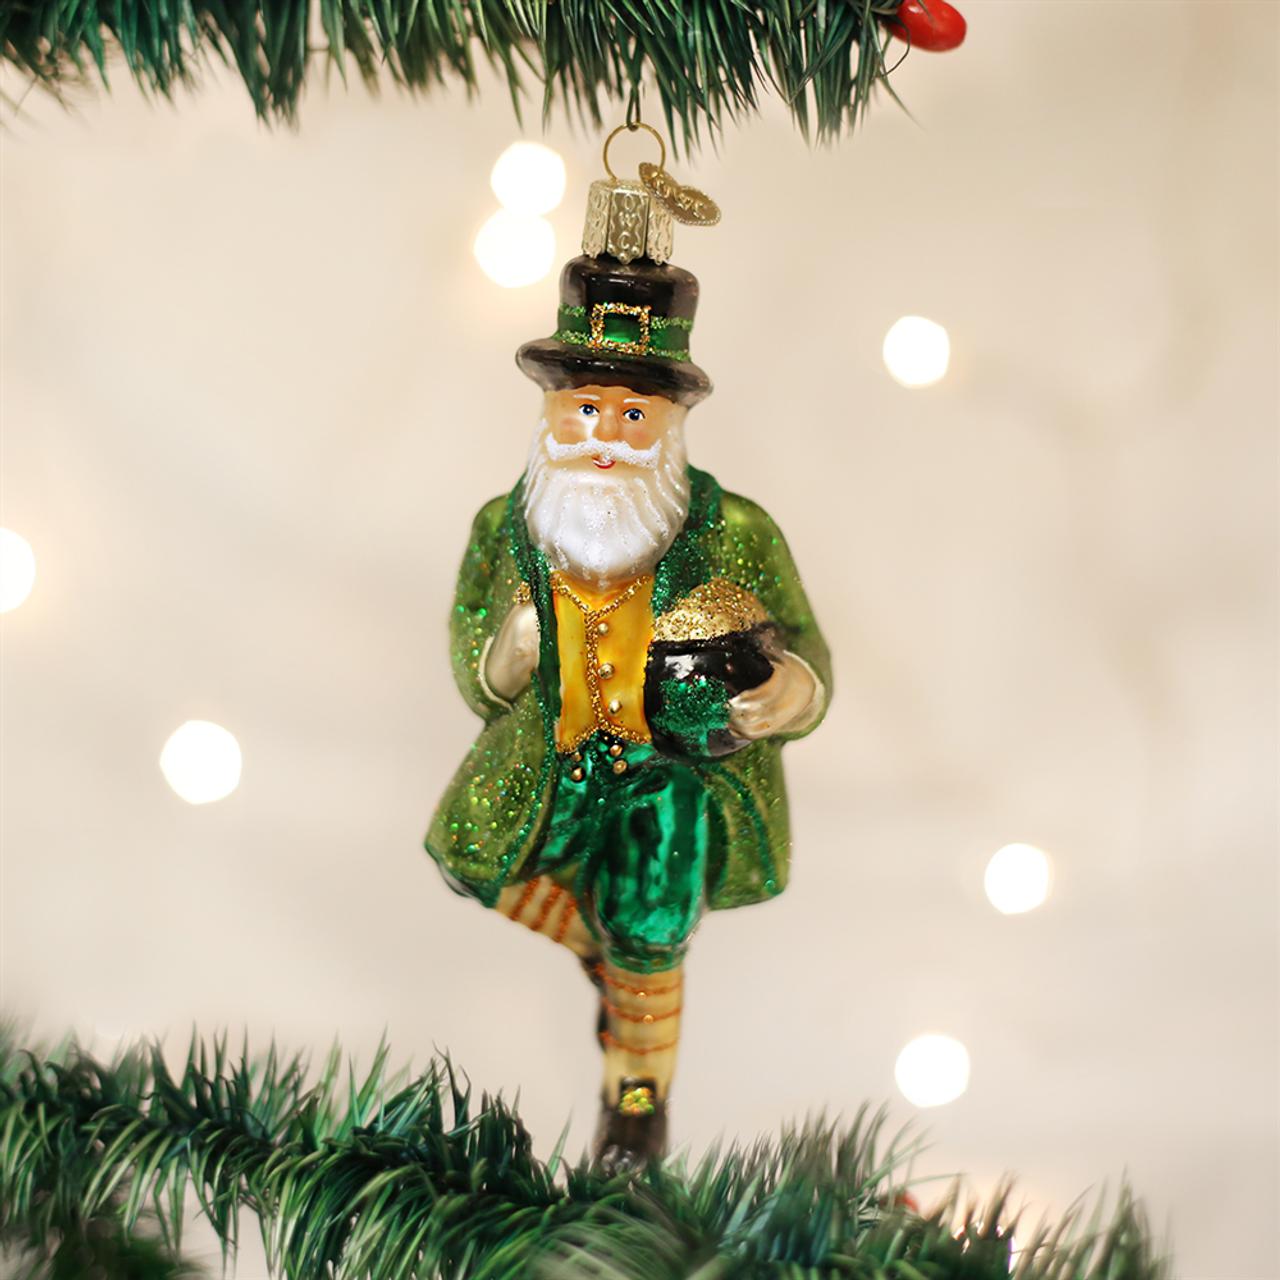 Celtic Christmas Gifts | Irish Christmas Decorations | Food